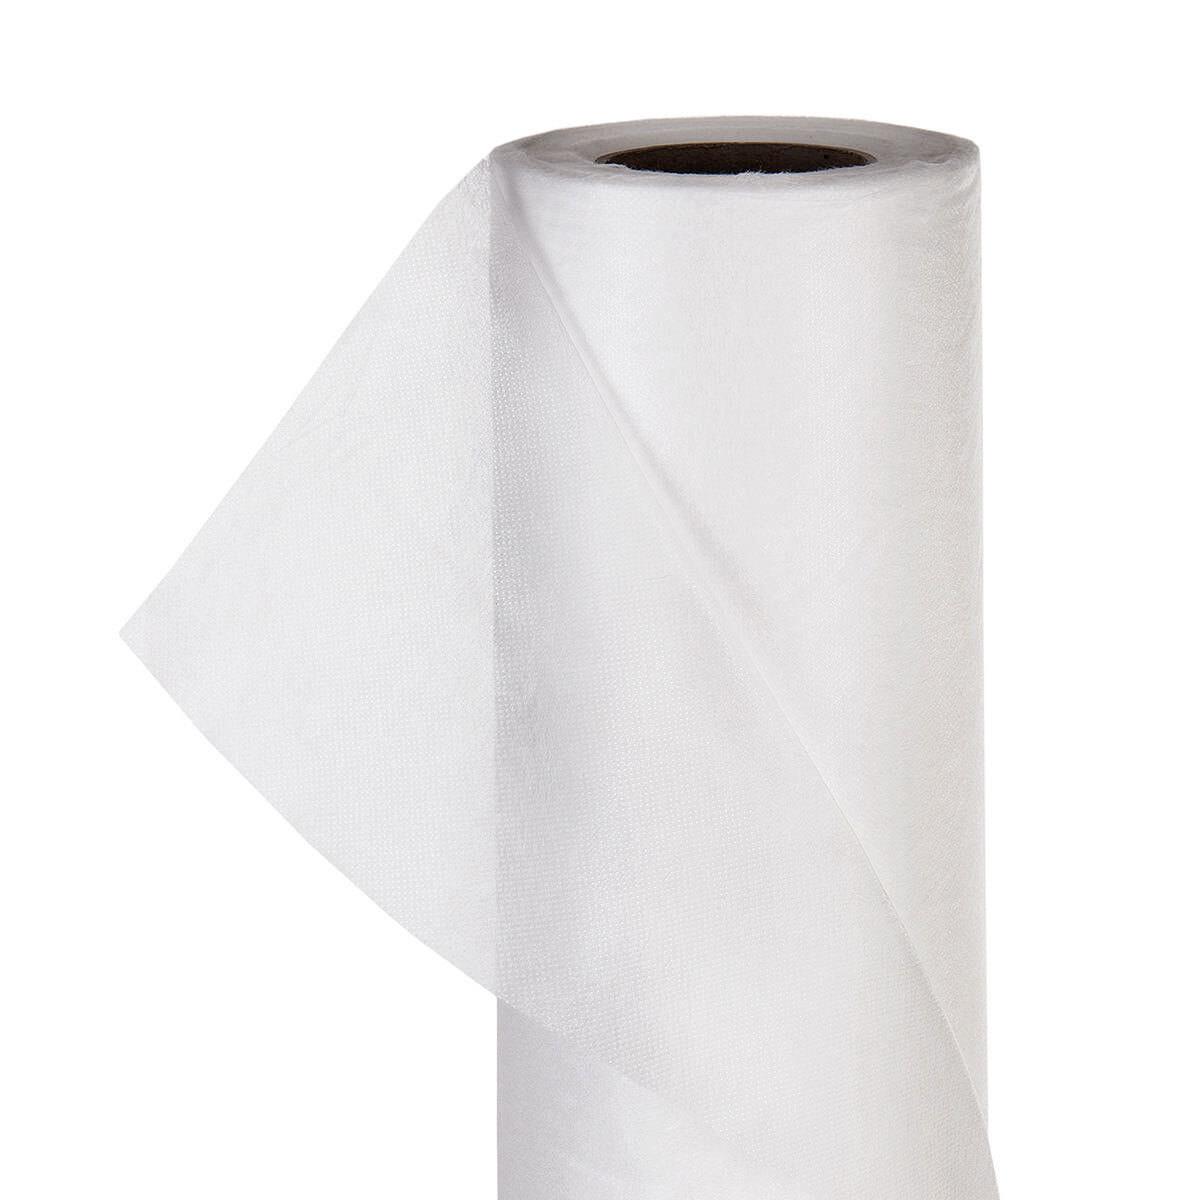 Tessuto di forzatura crescita tessuto tessuto tessuto di copertura protezione raccolto tessuto non tessuto 30g 6,35m x 50m